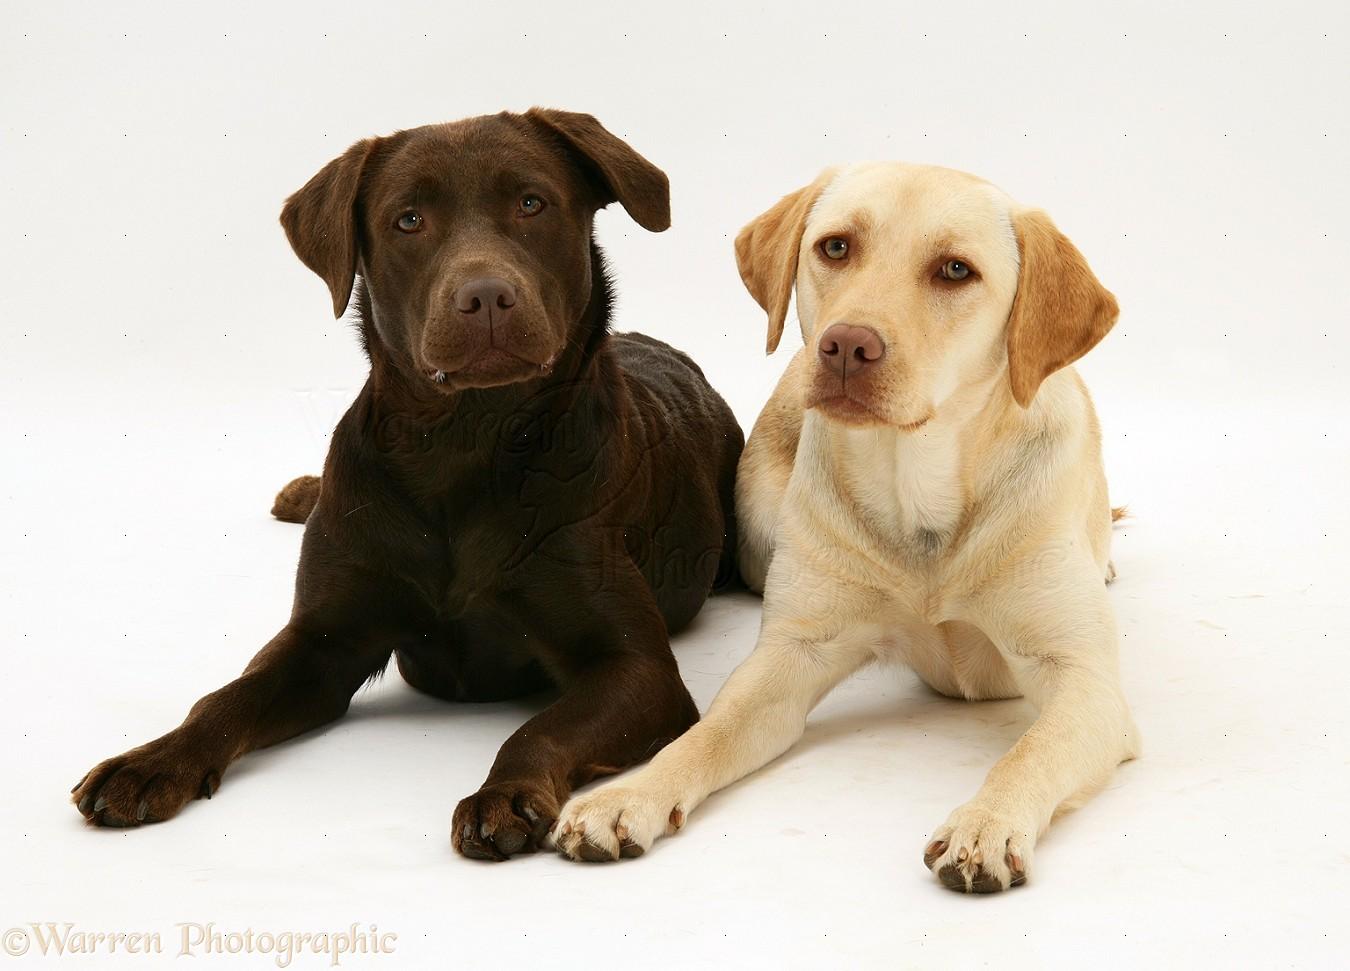 Dogs: Yellow and chocolate Labrador Retrievers photo - WP26658